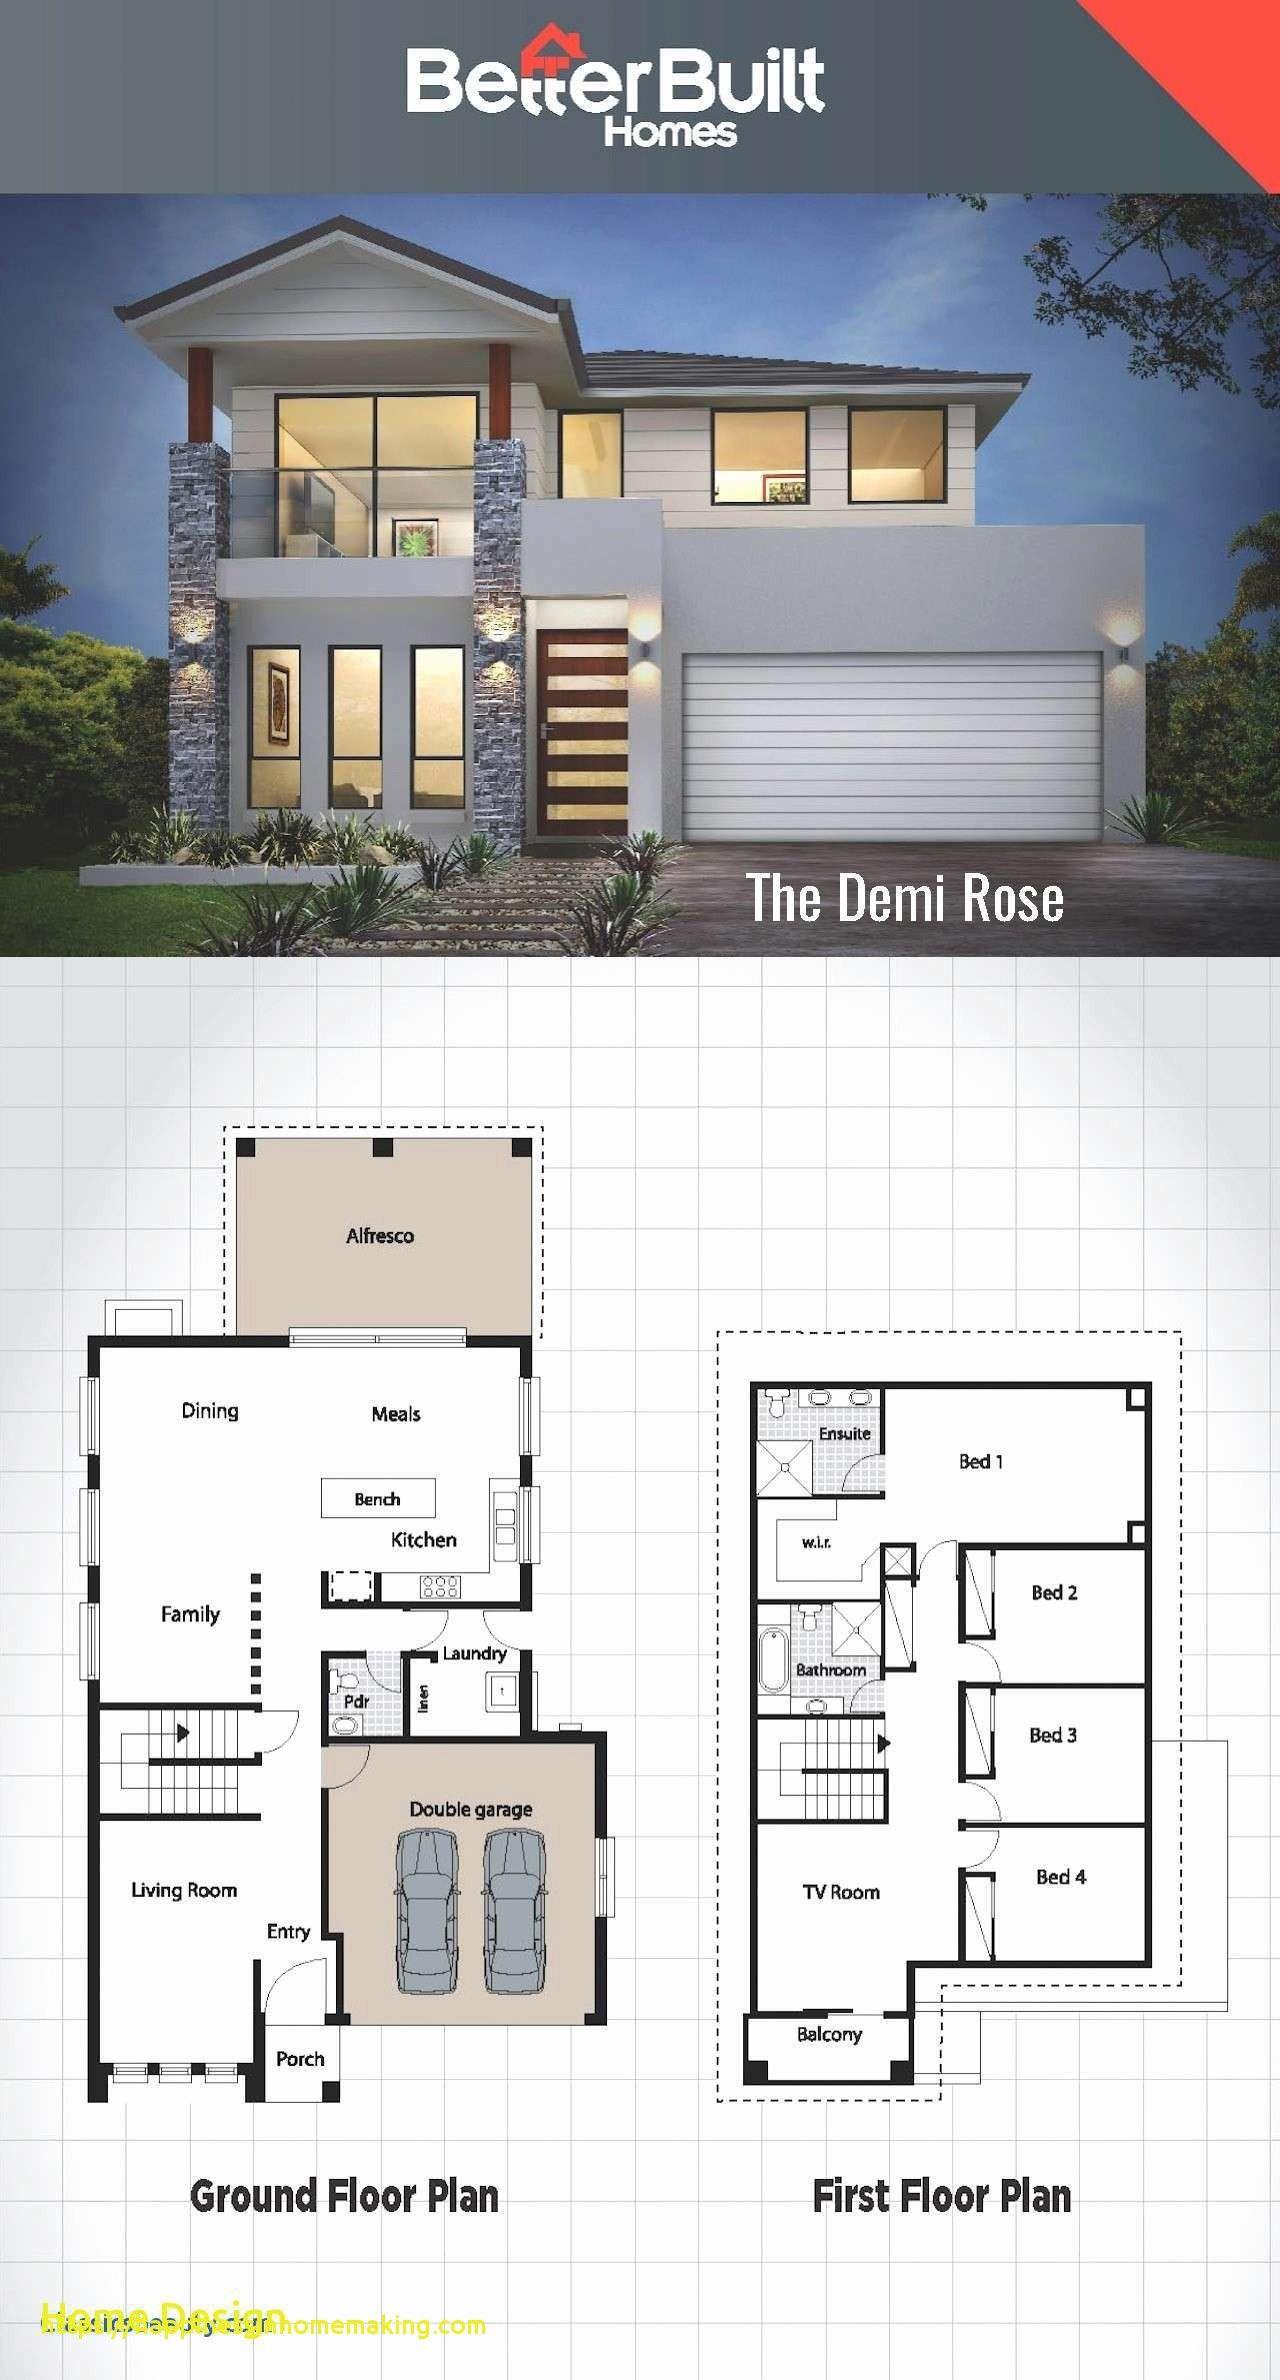 12 Genius Designs Of How To Build Bedroom Designs Modern Interior Design Ideas Photos House Blueprints Modern House Floor Plans Cottage Floor Plans